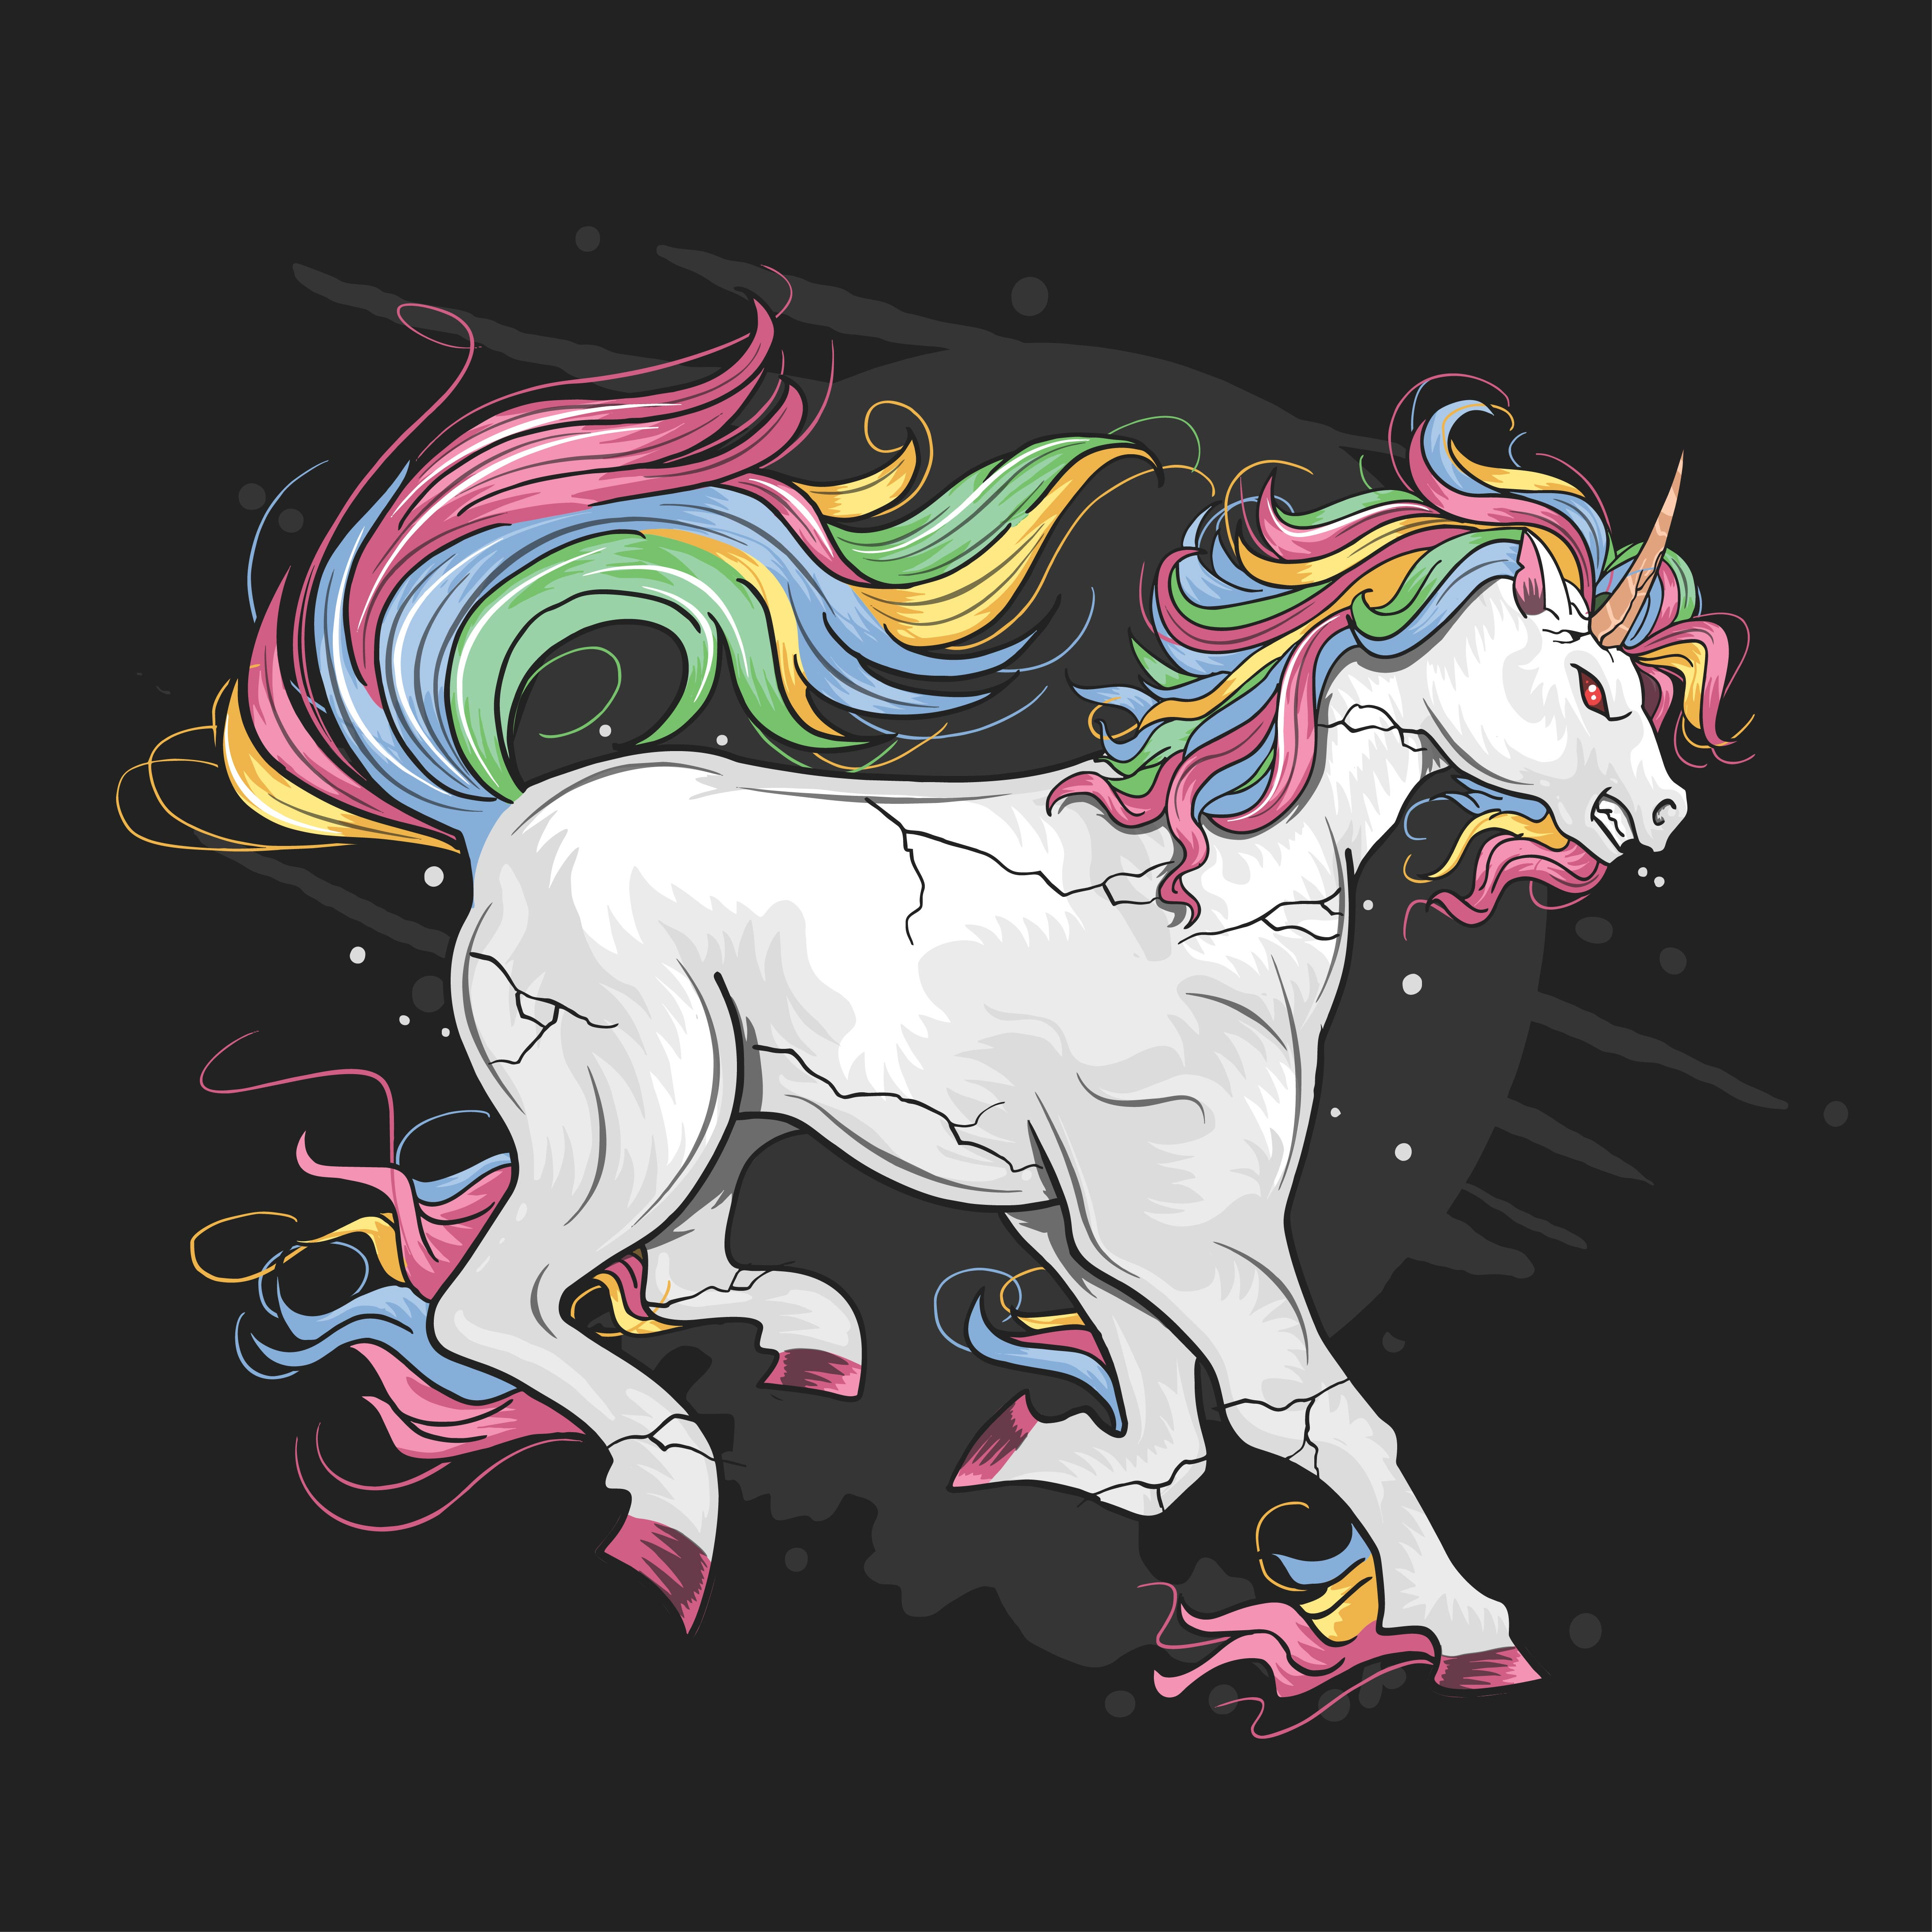 mad rainbow unicorn 1133972  download free vectors